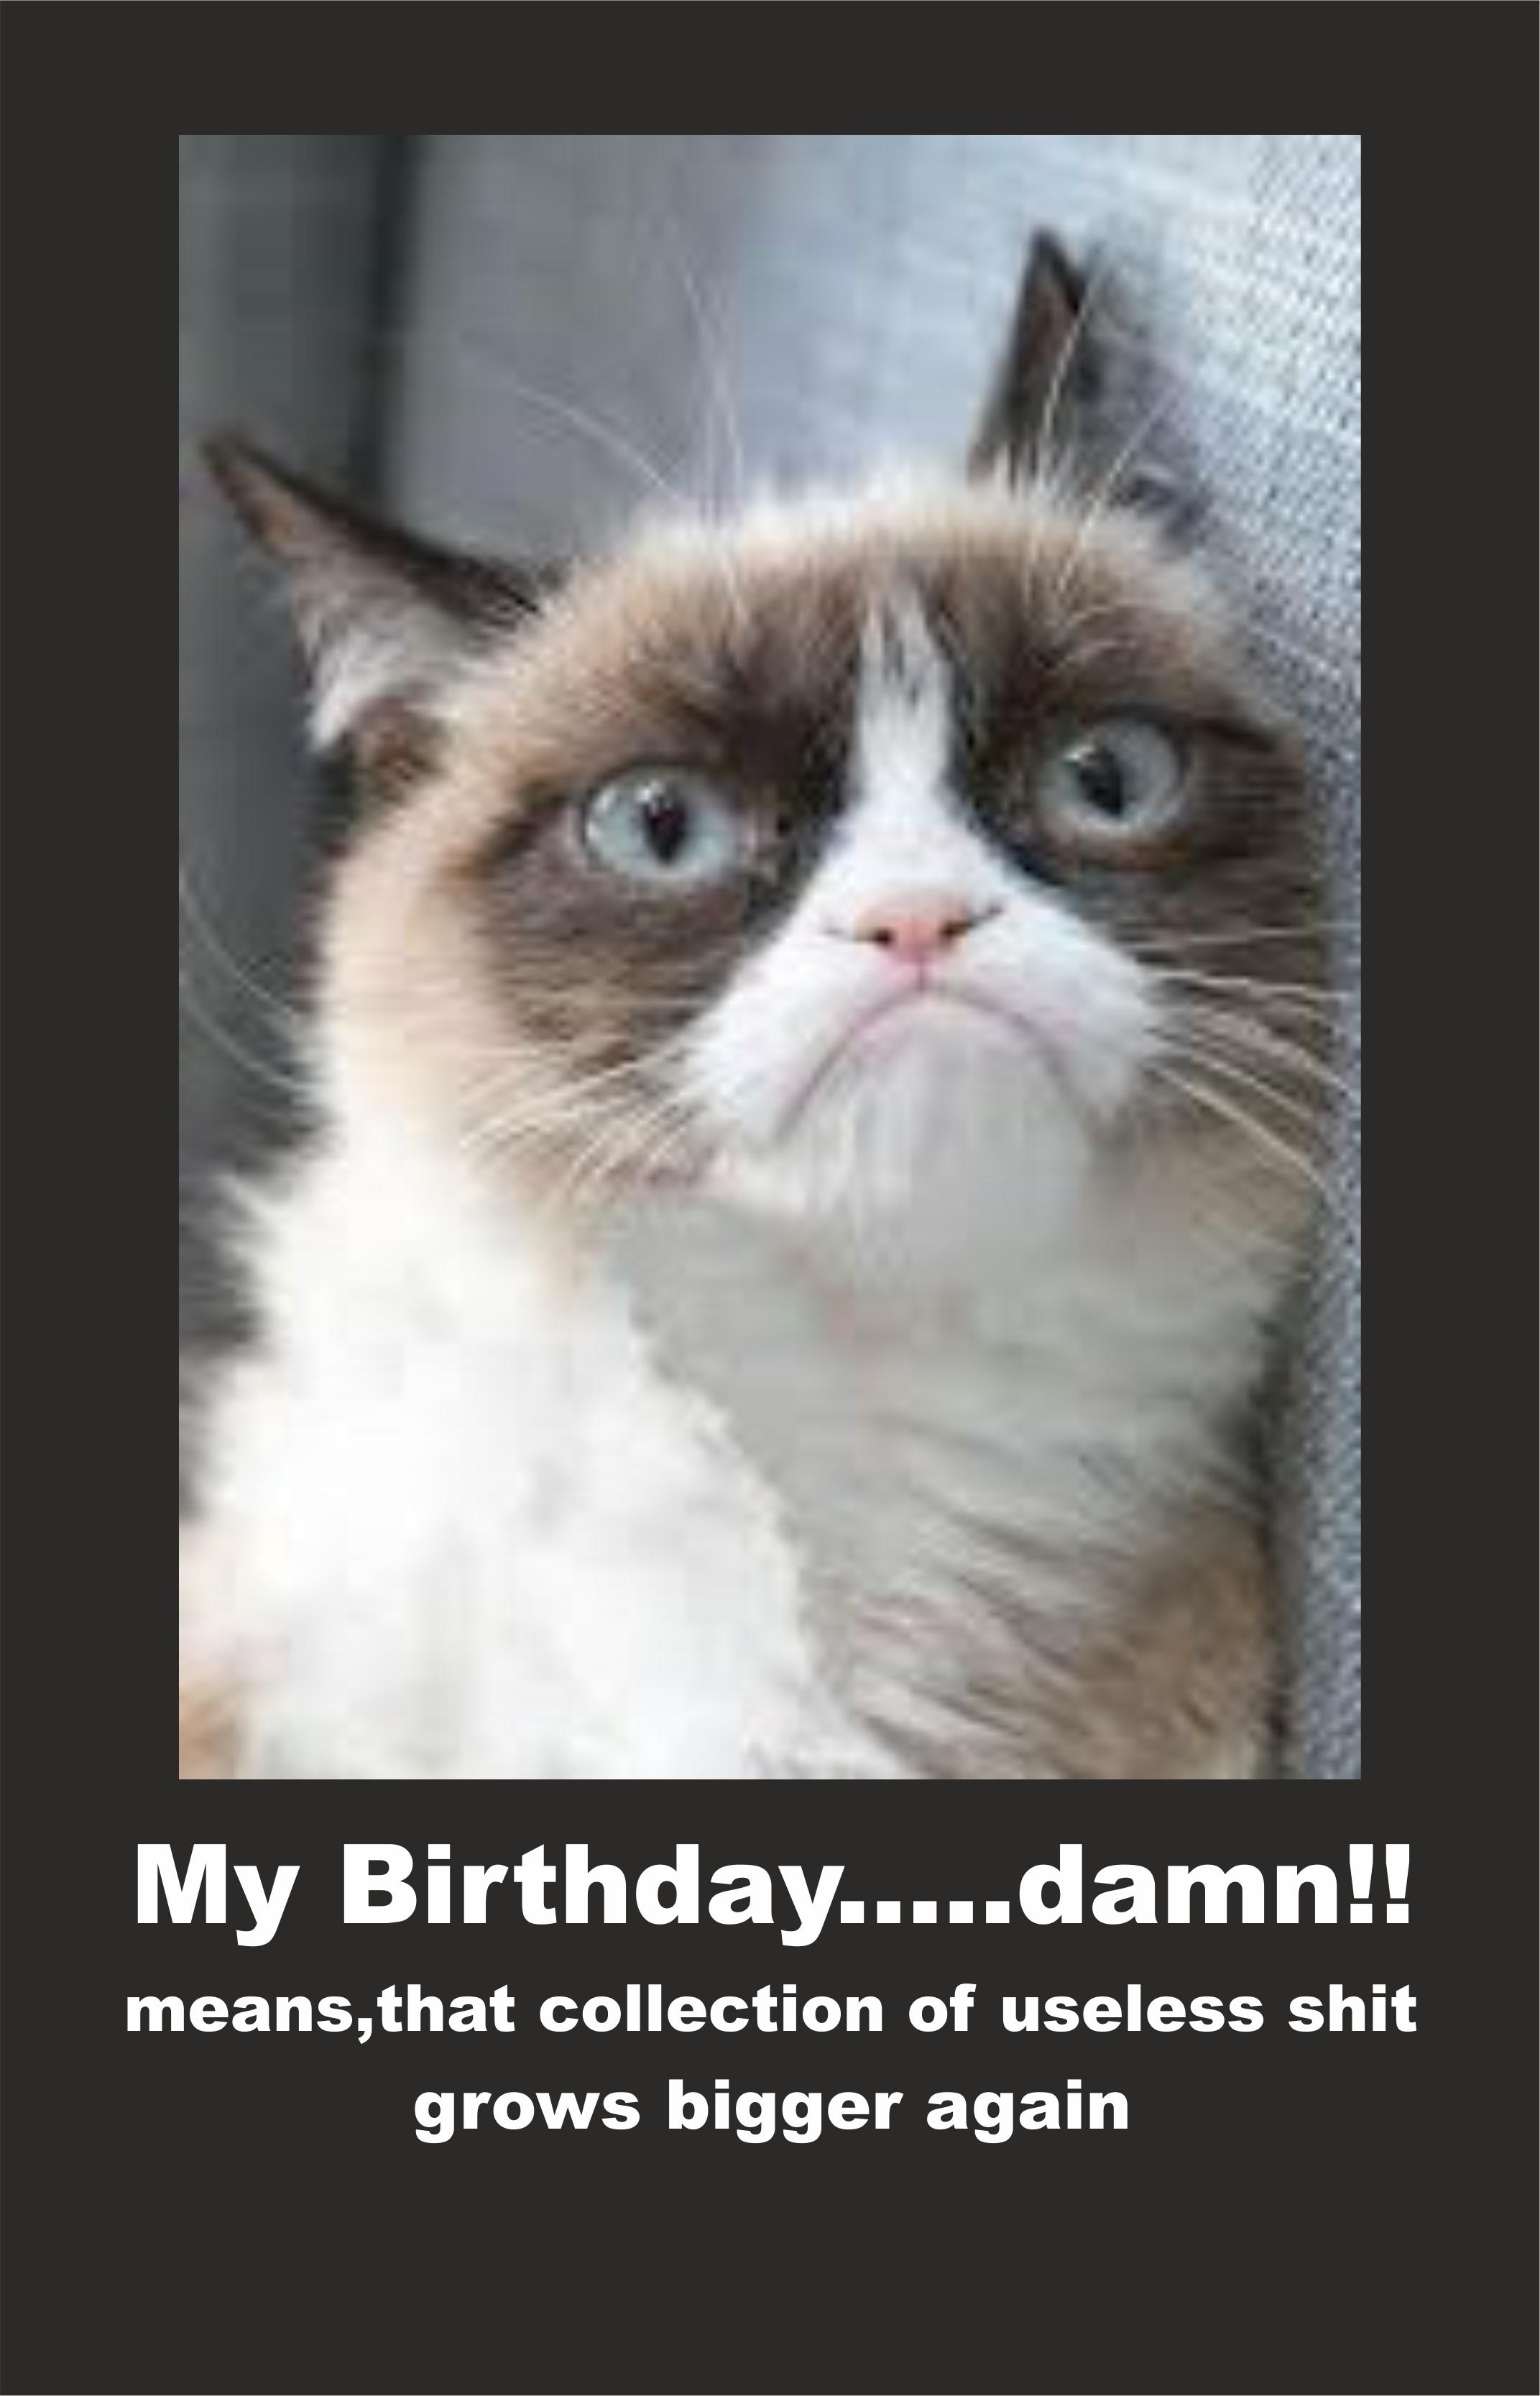 2c5 image 614122] grumpy cat know your meme